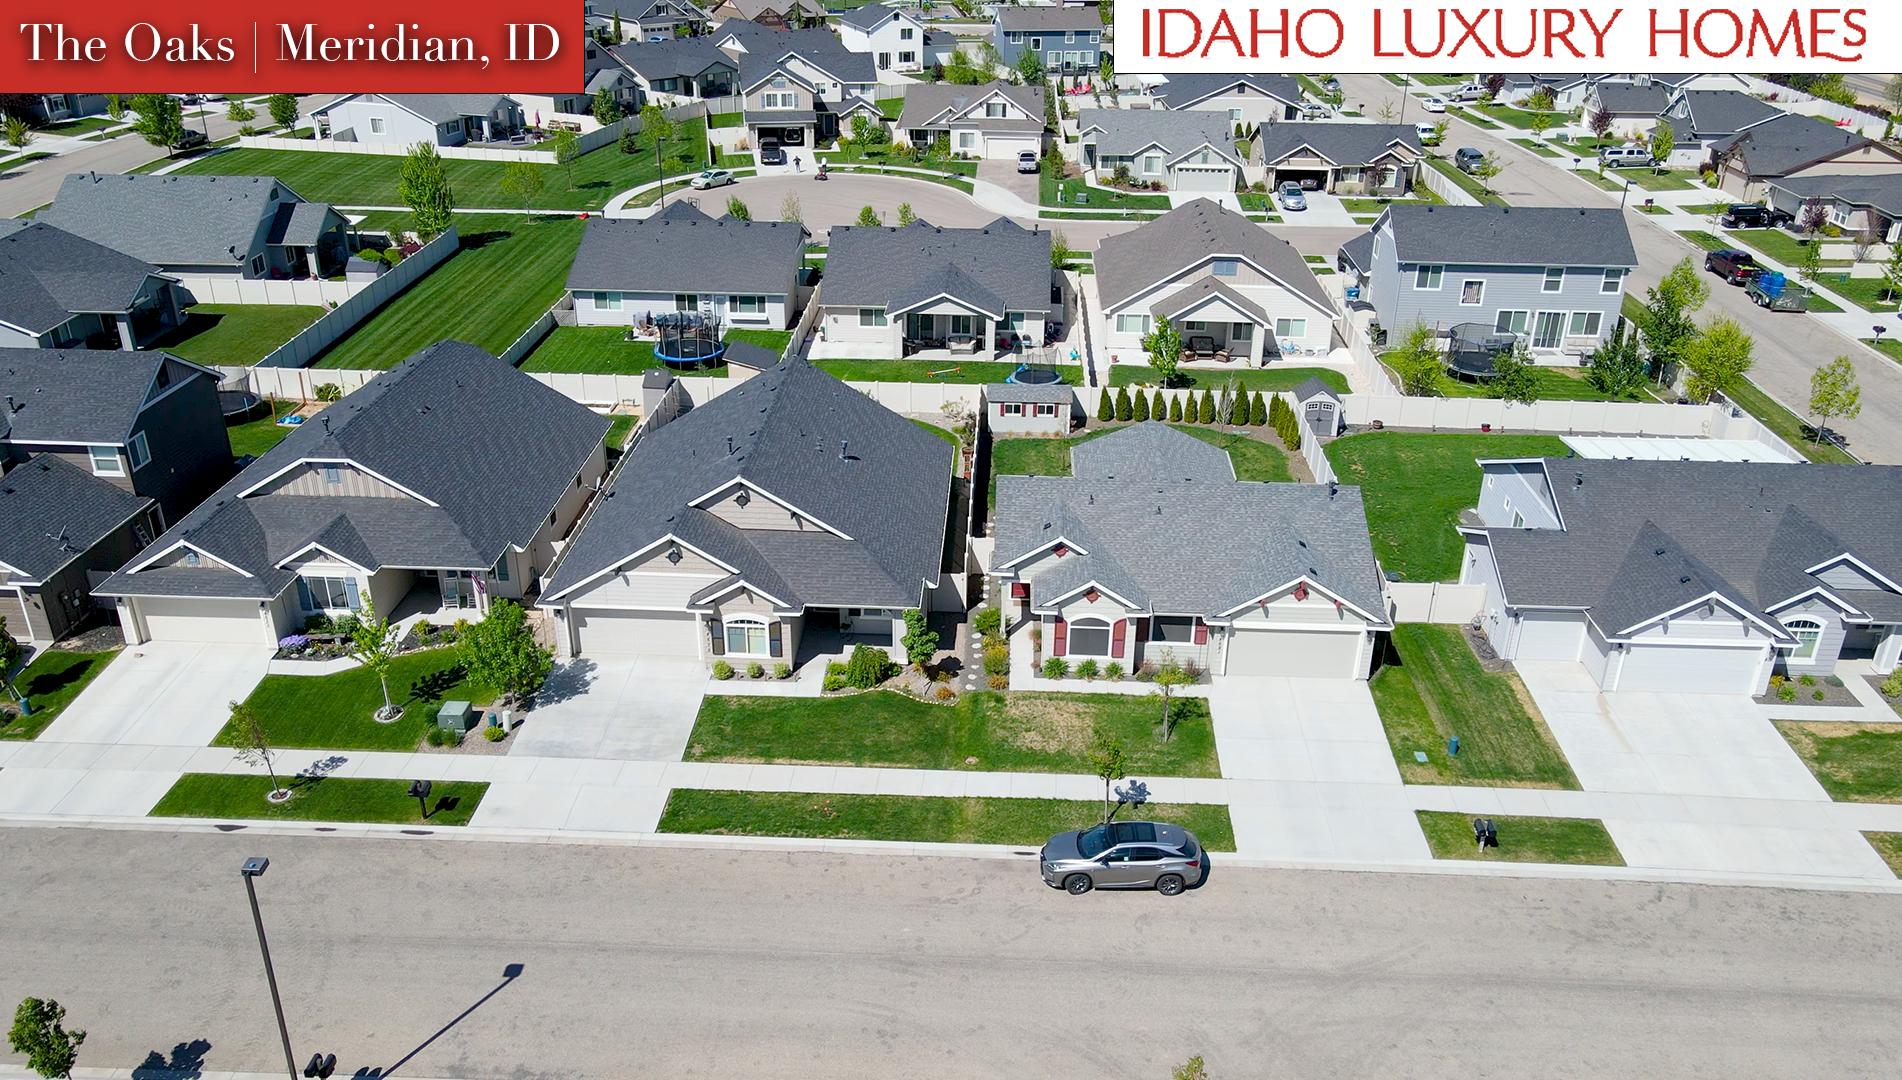 The Oaks Real Estate